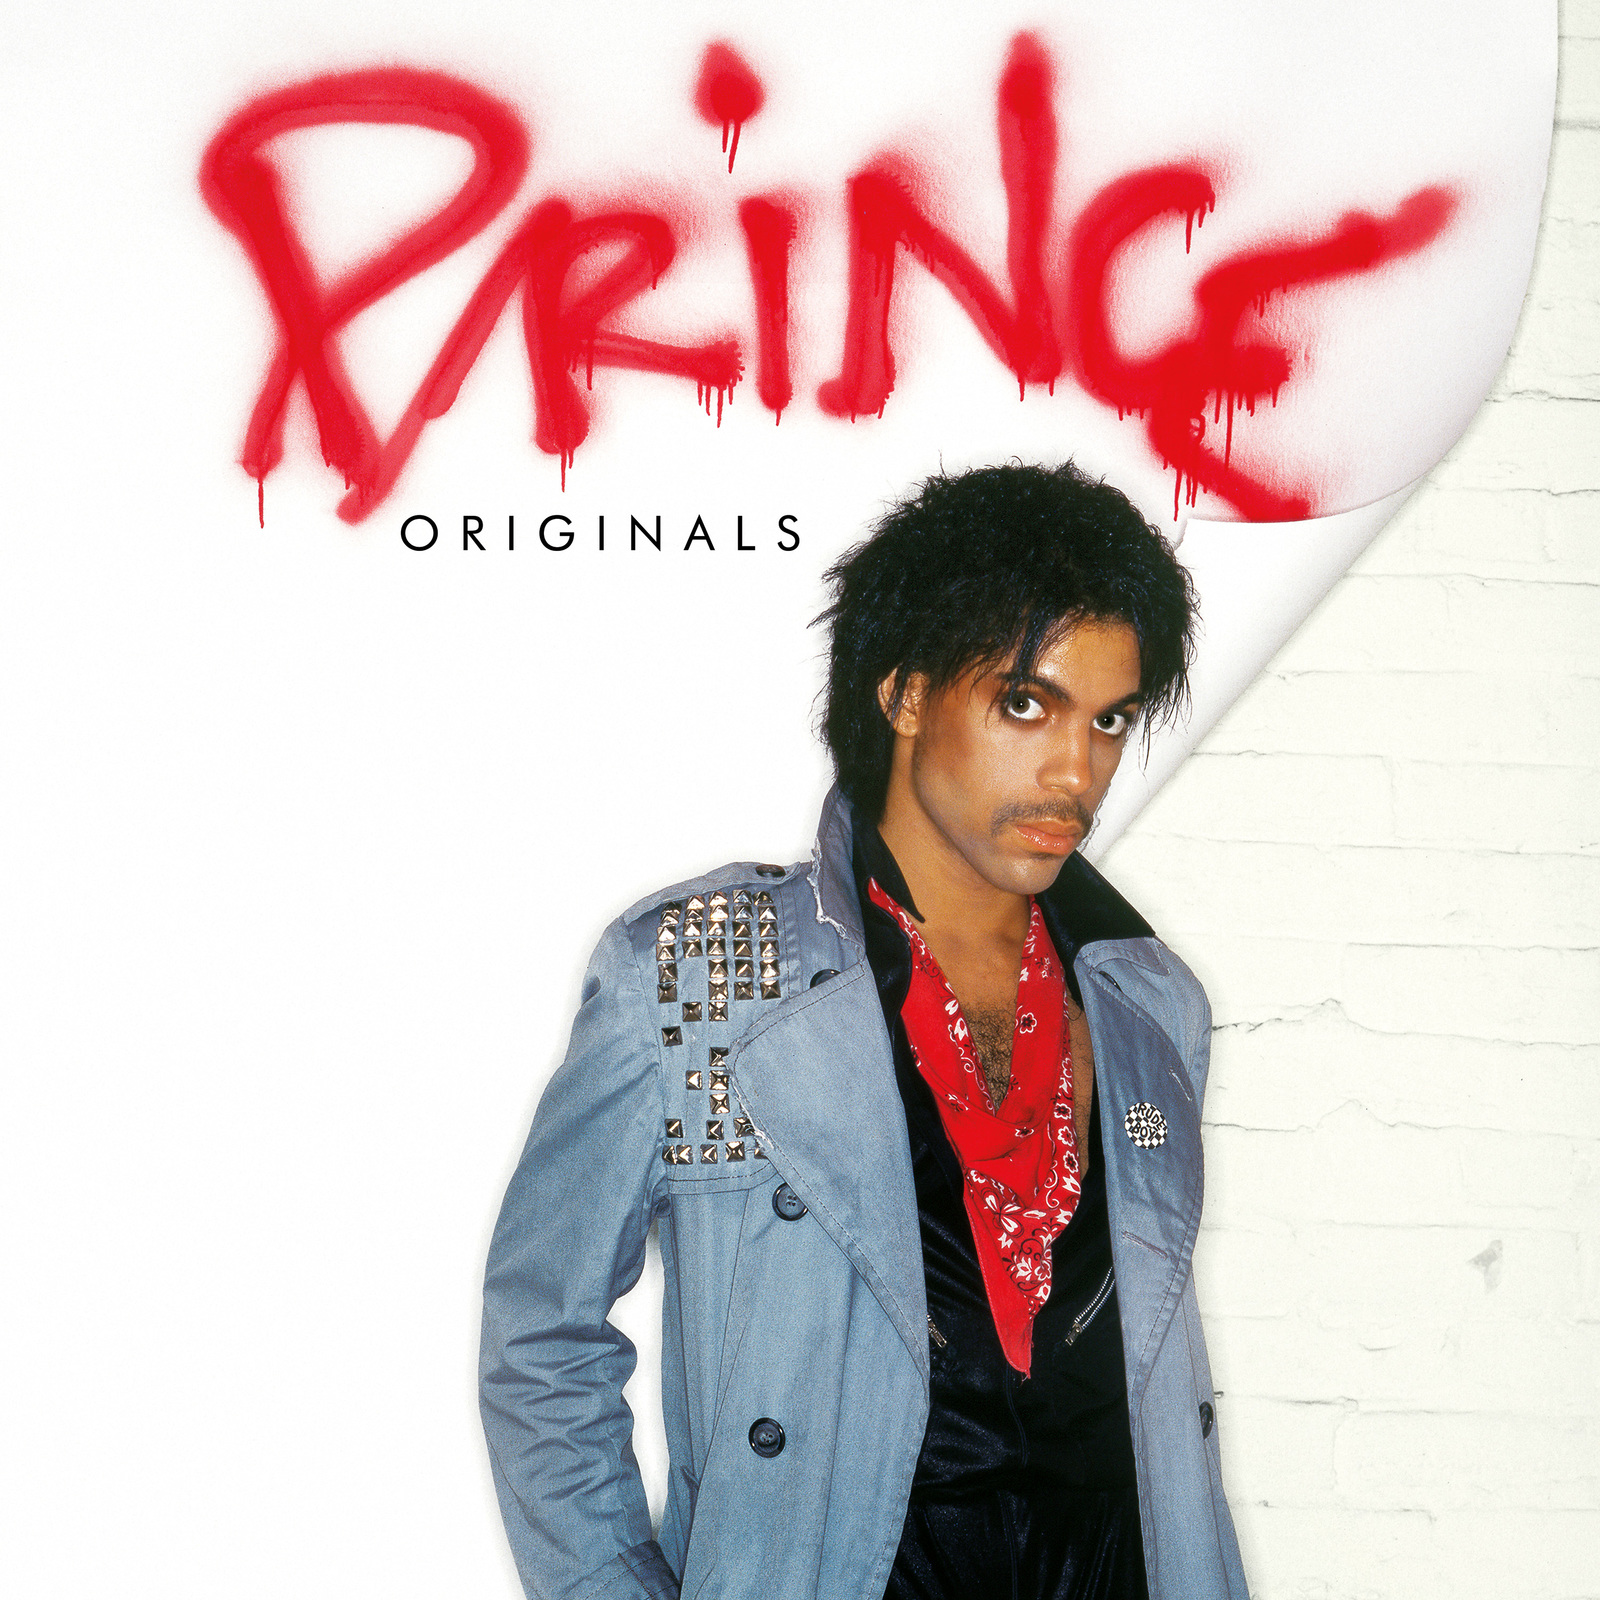 Originals by Prince image